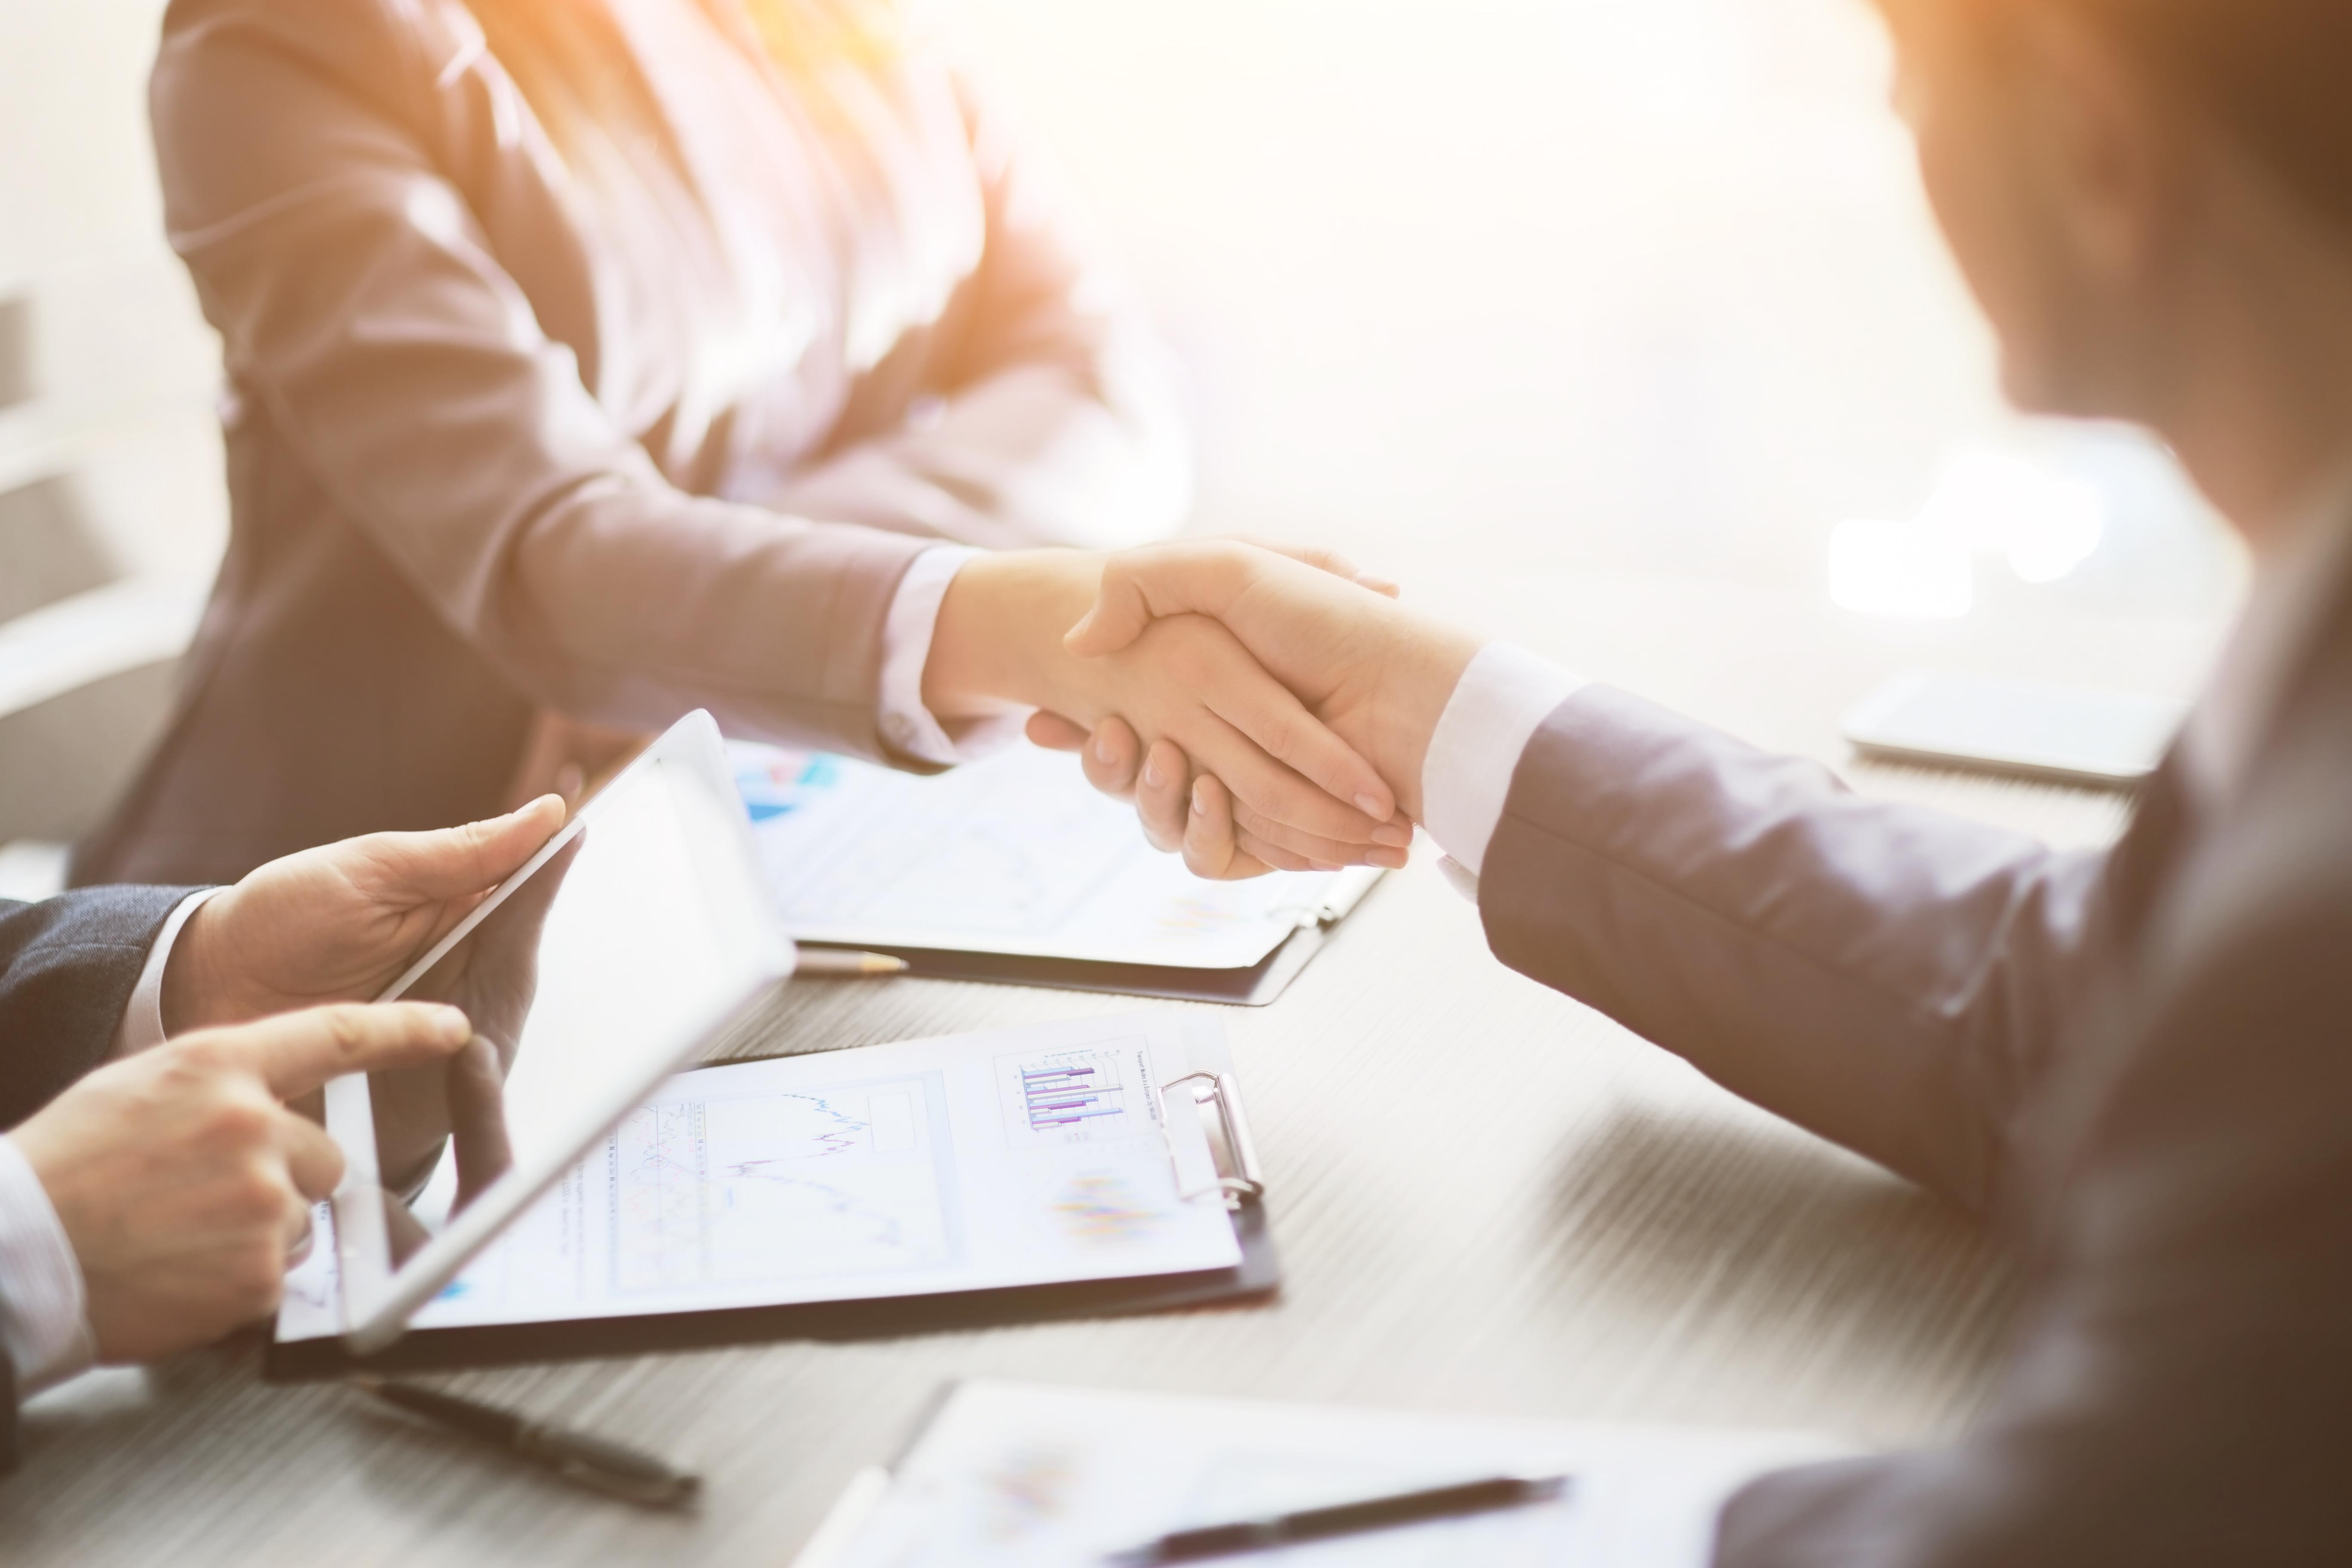 iStock-Business_people_shaking_hands.jpg